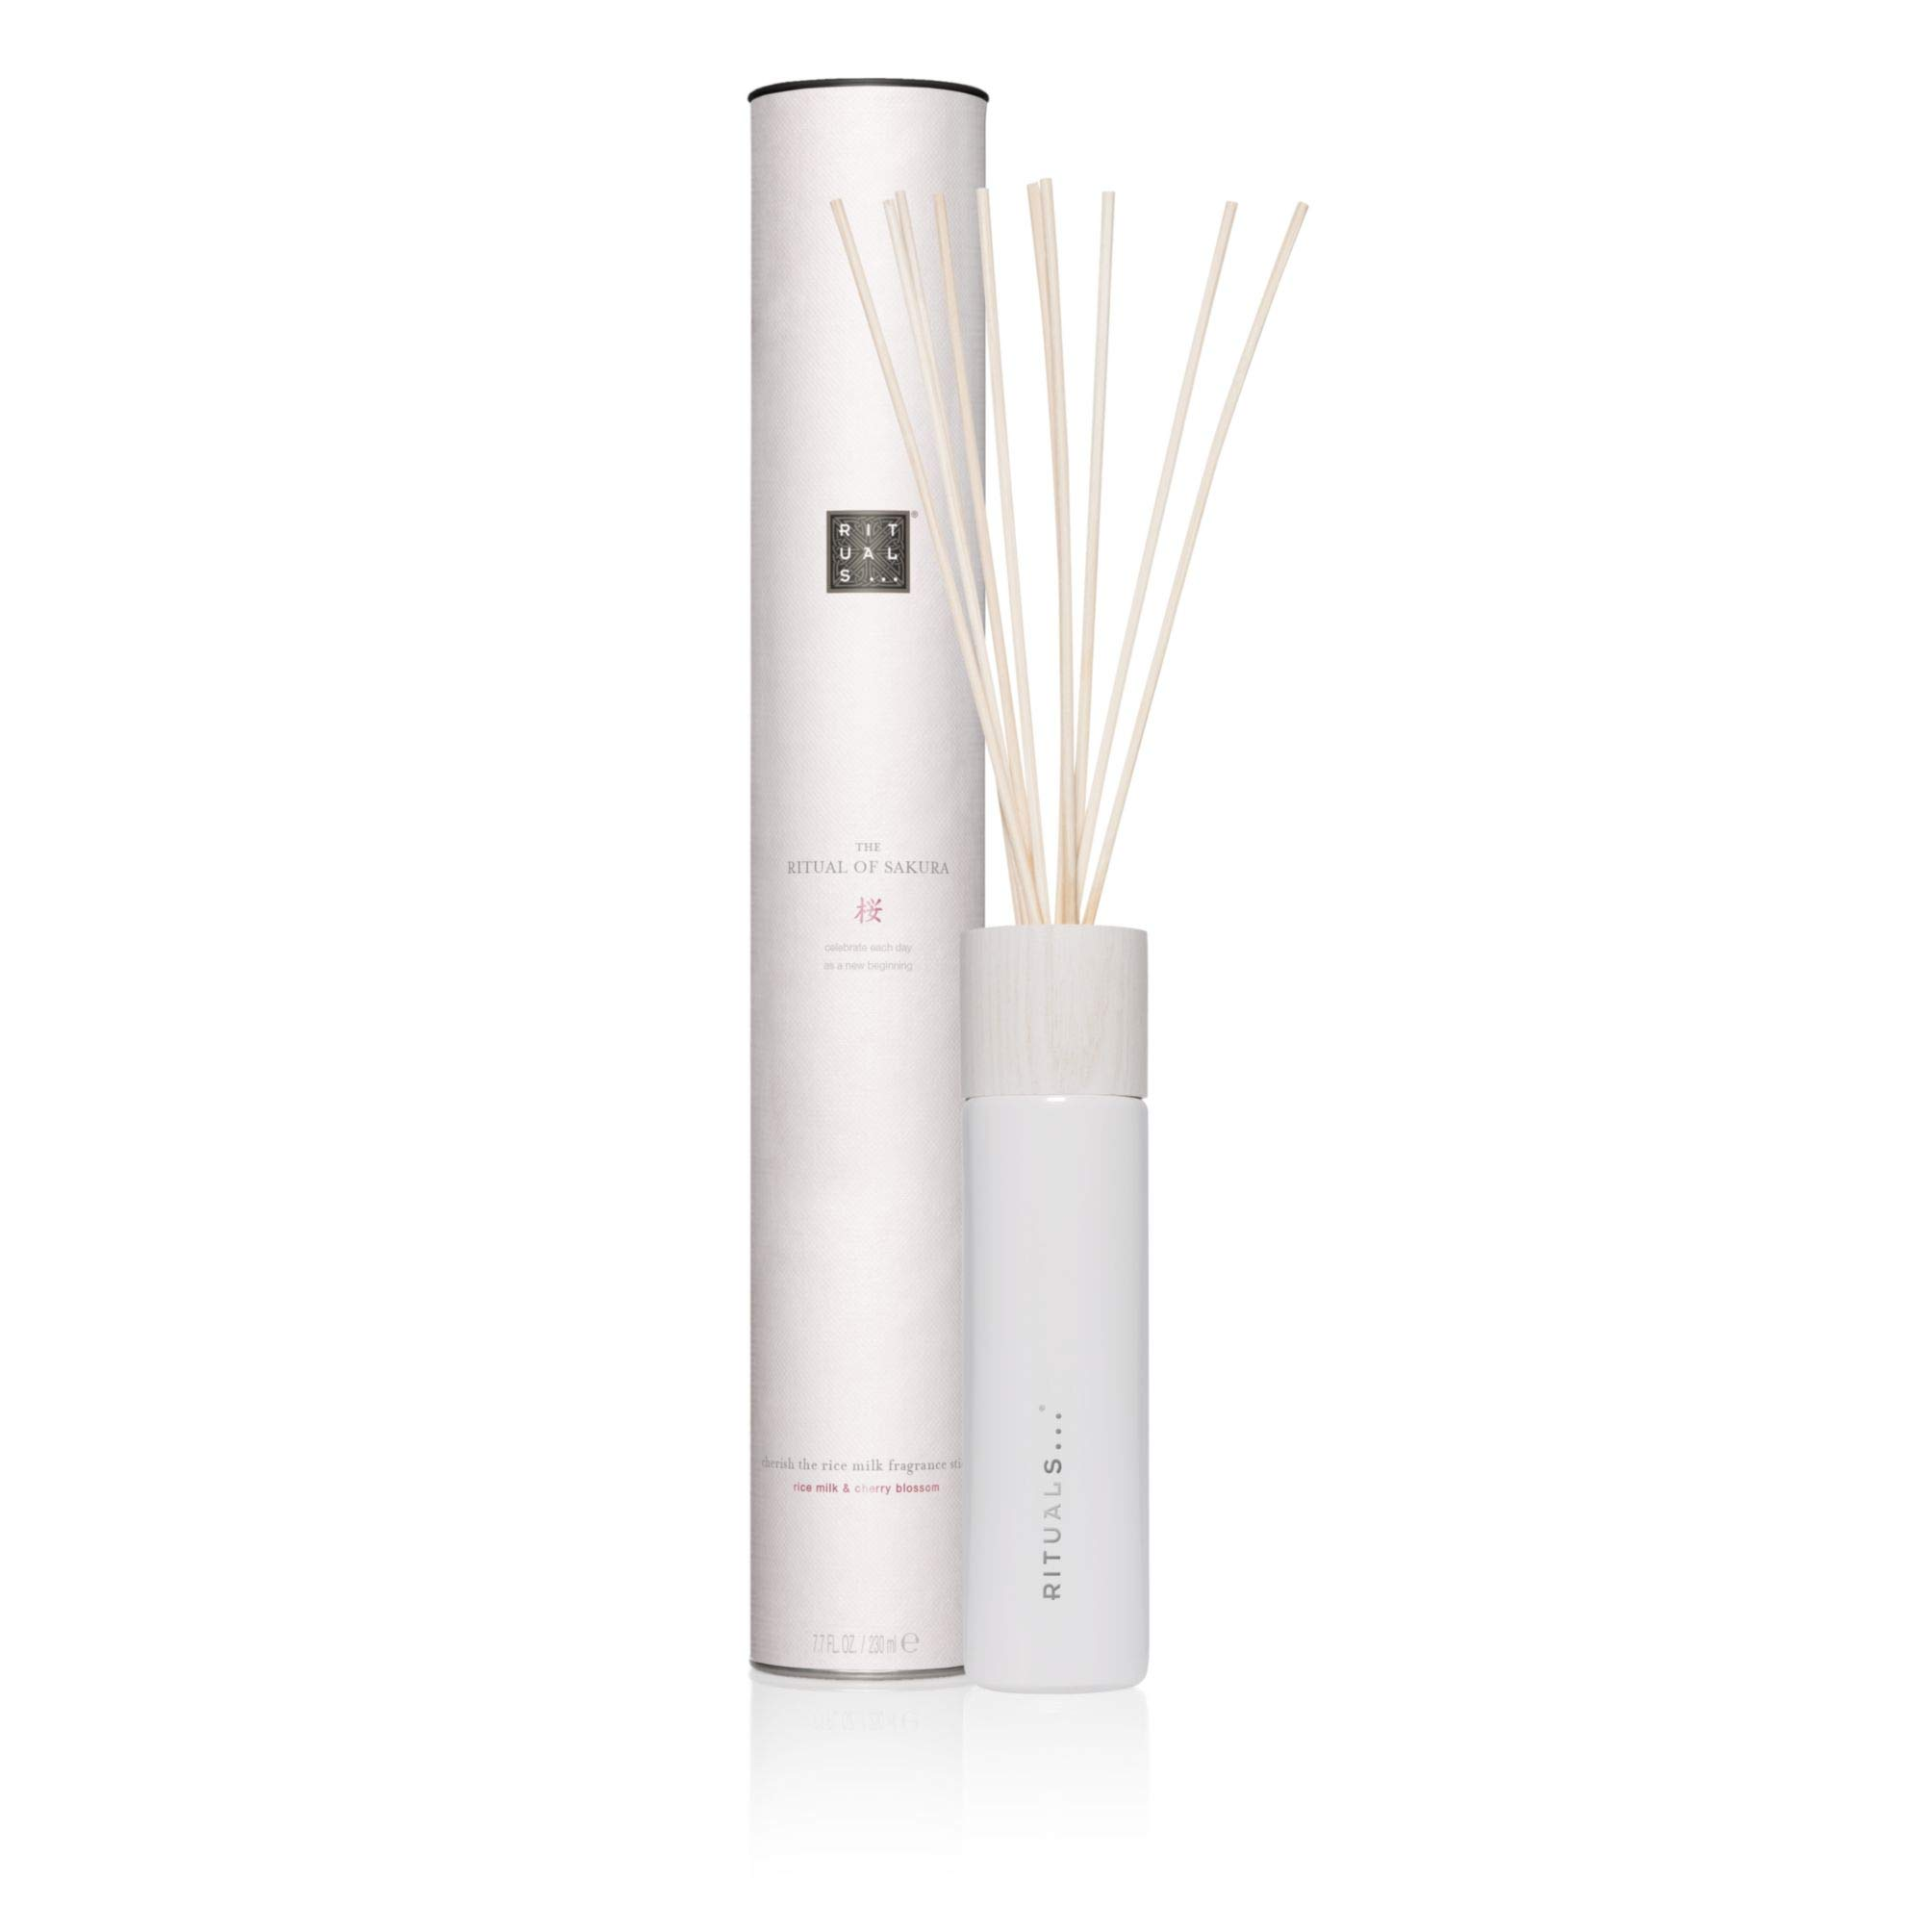 RITUALS The Rituals of Sakura Large Fragrance Sticks, 230ml